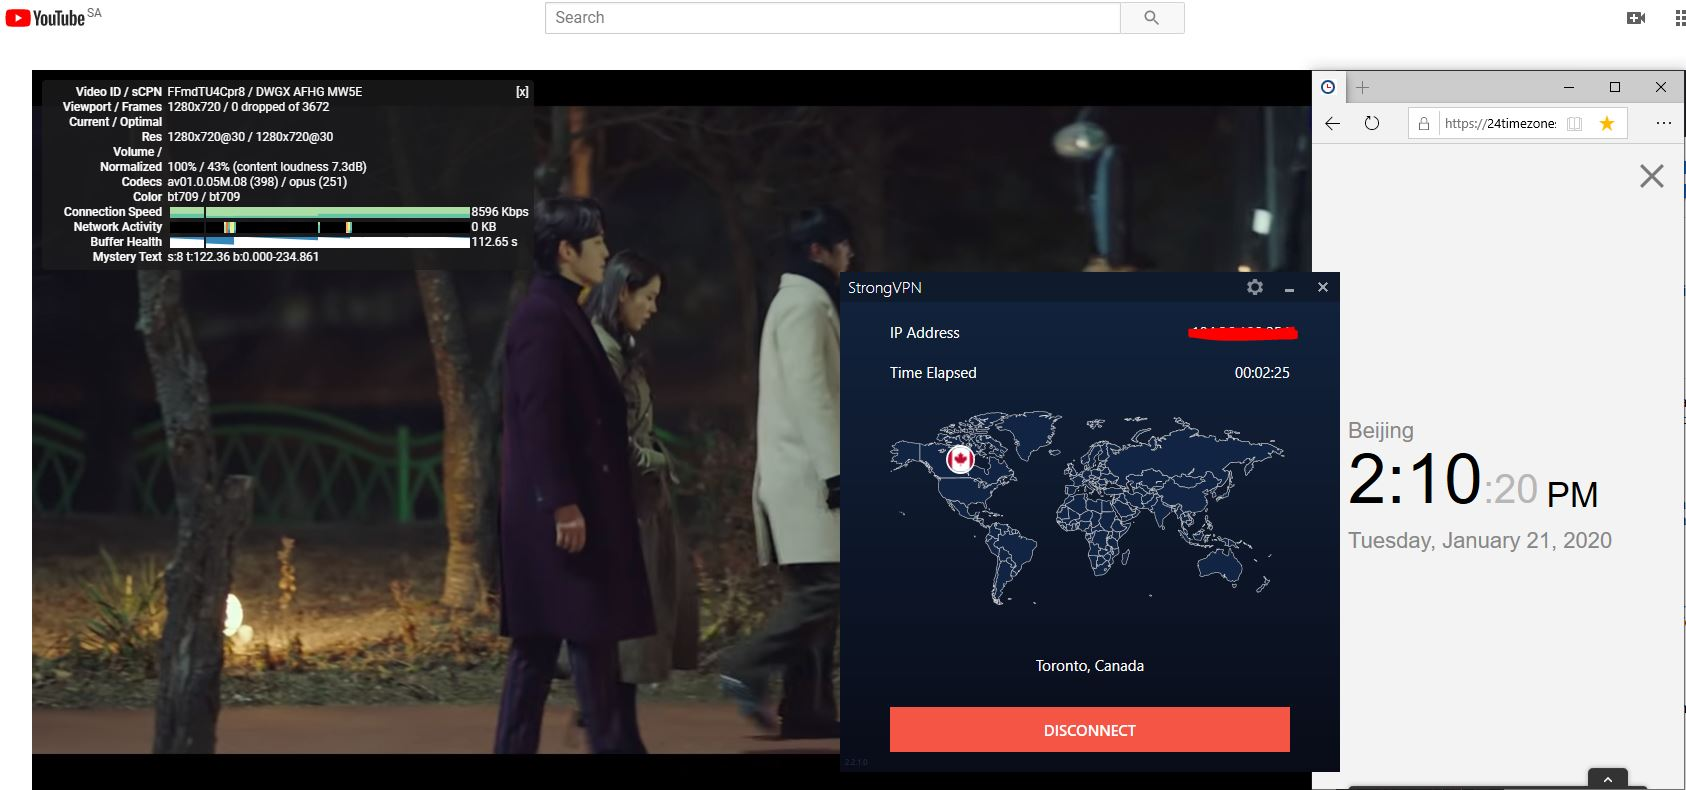 Windows10 StrongVPN Canada - Toronto 中国VPN翻墙 科学上网 Youtube测速-20200121